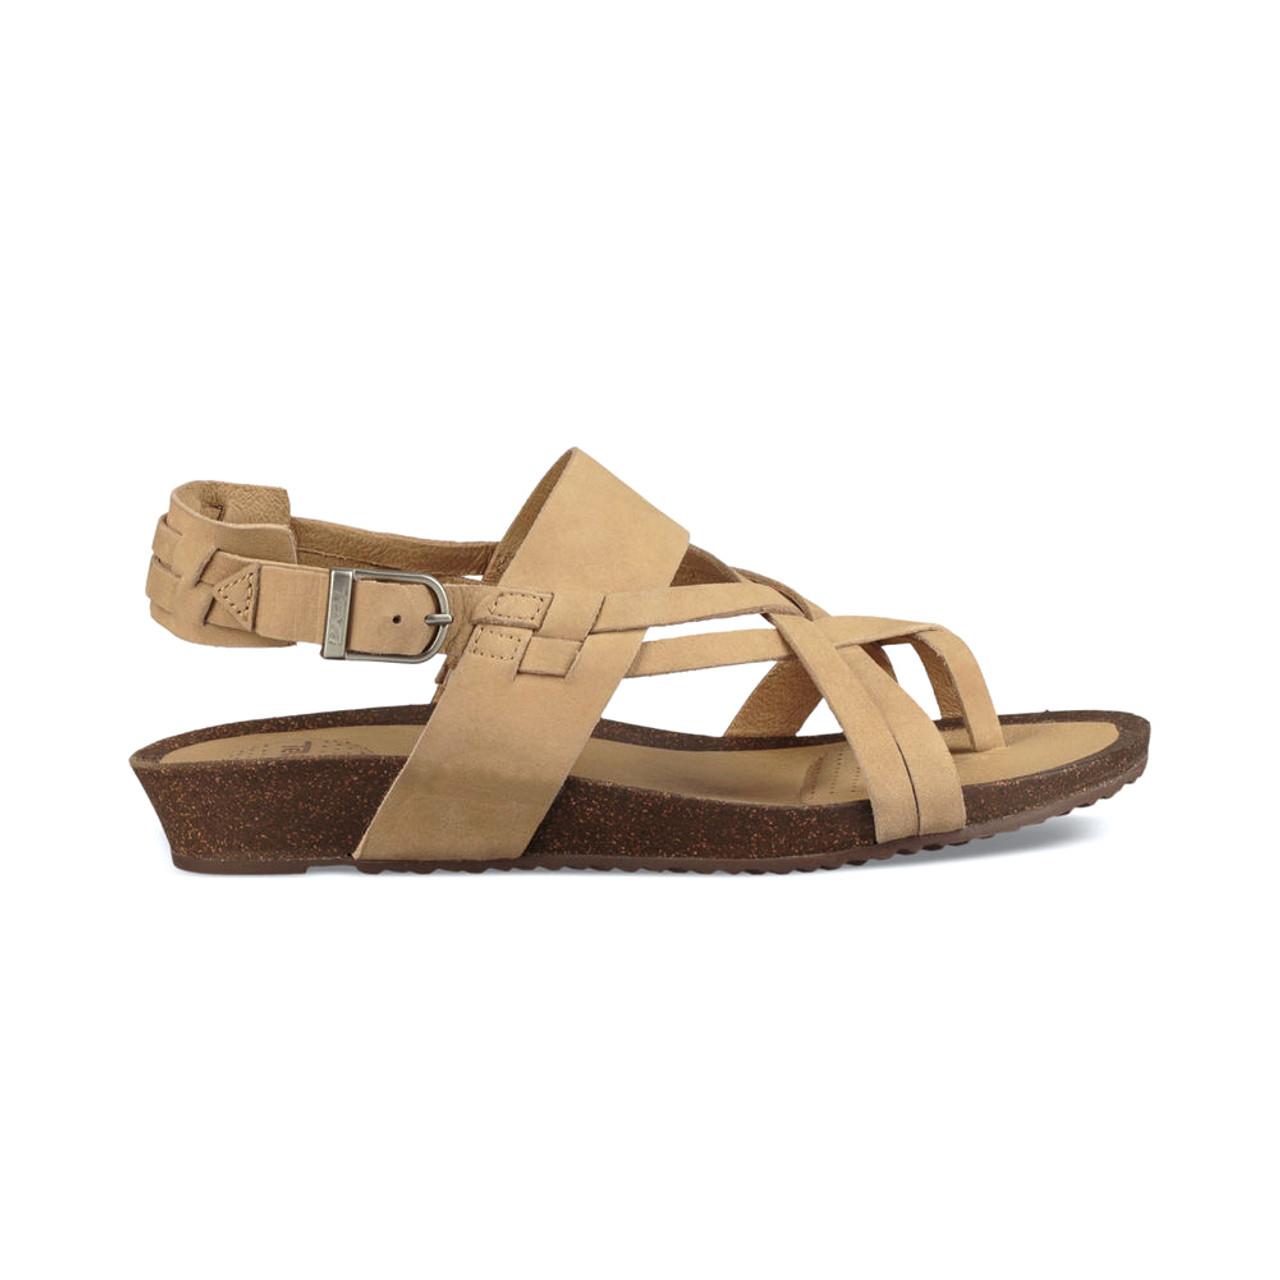 58a8e5a39 Teva Women s Ysidro Extension Sandal Lark - Shop now   Shoolu.com